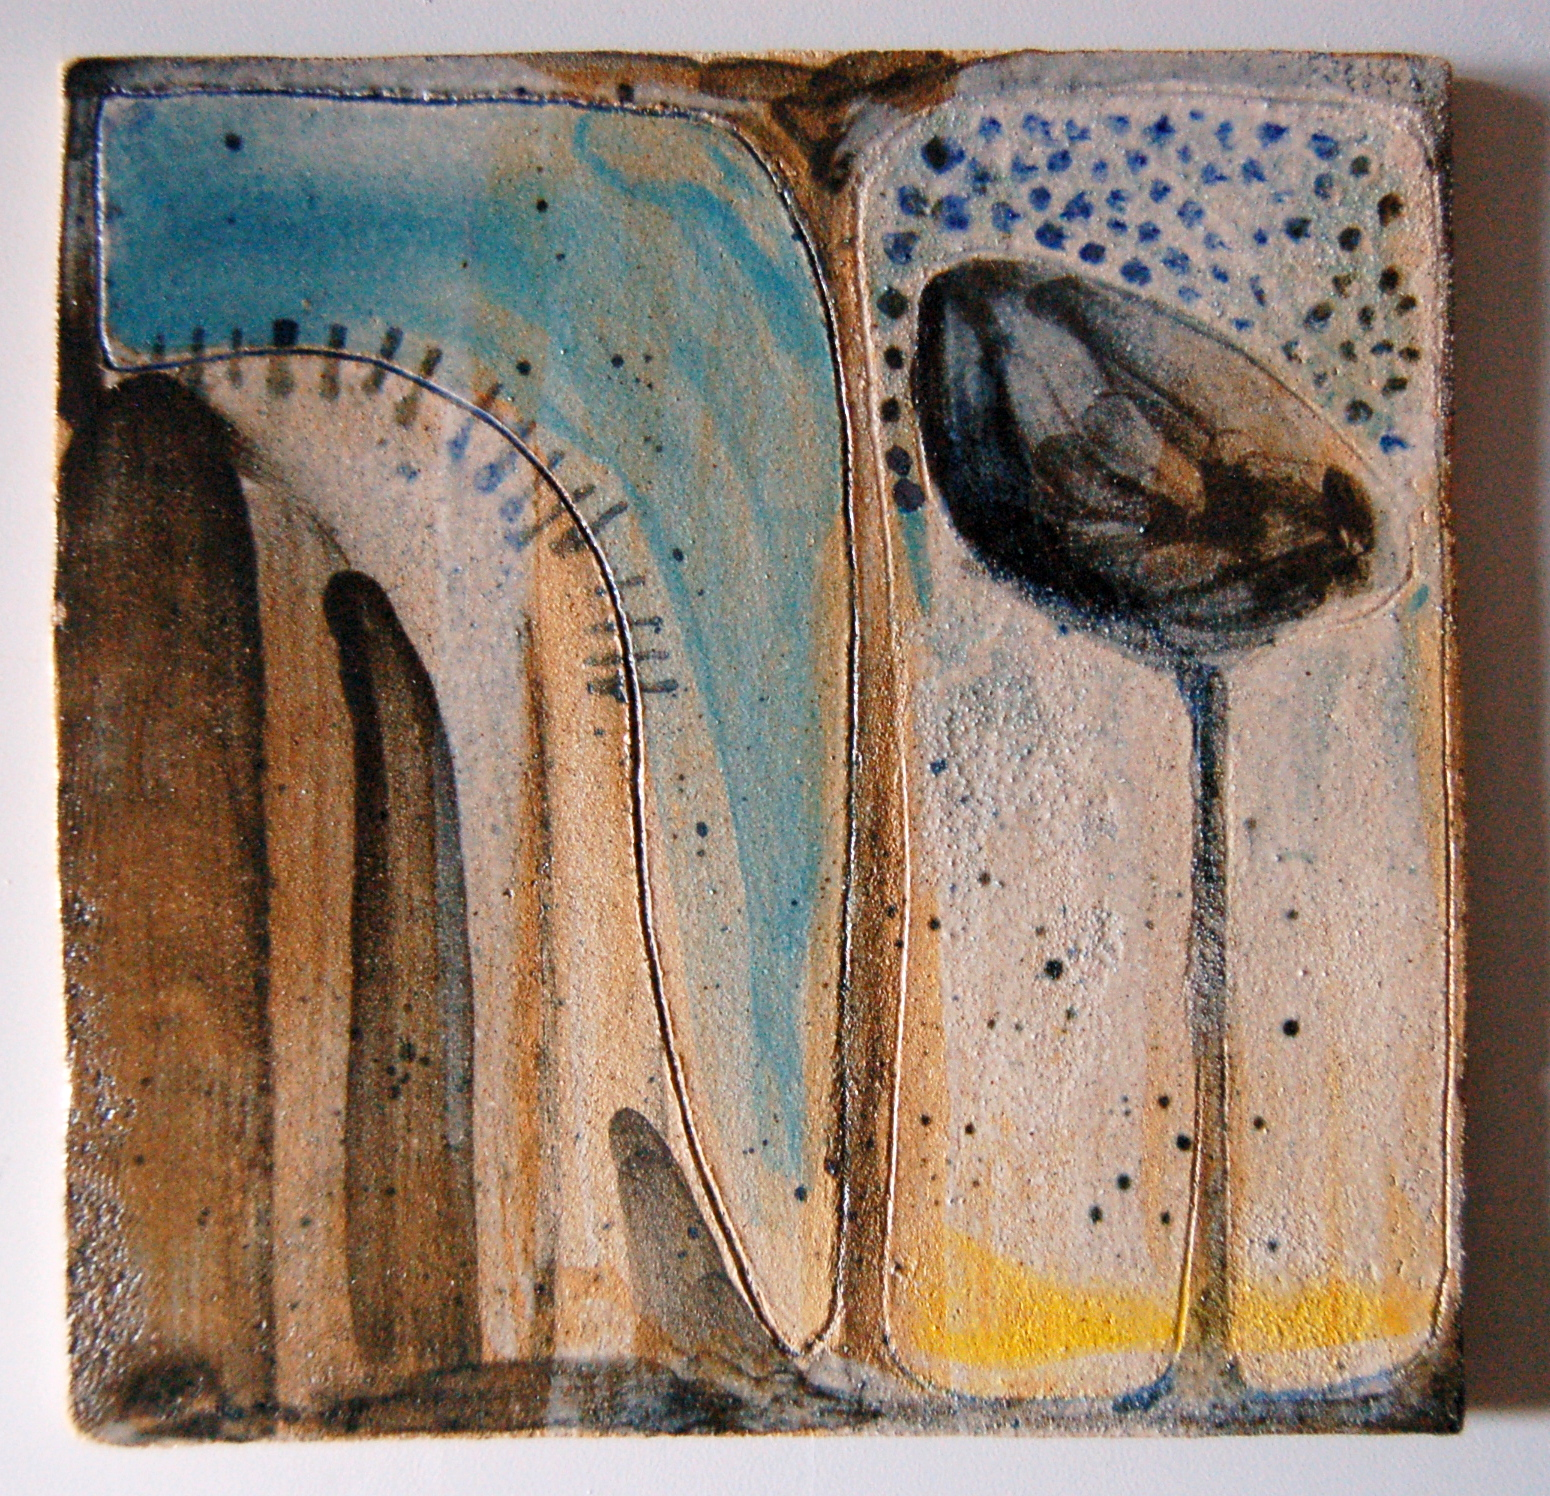 Pintar en cerámica